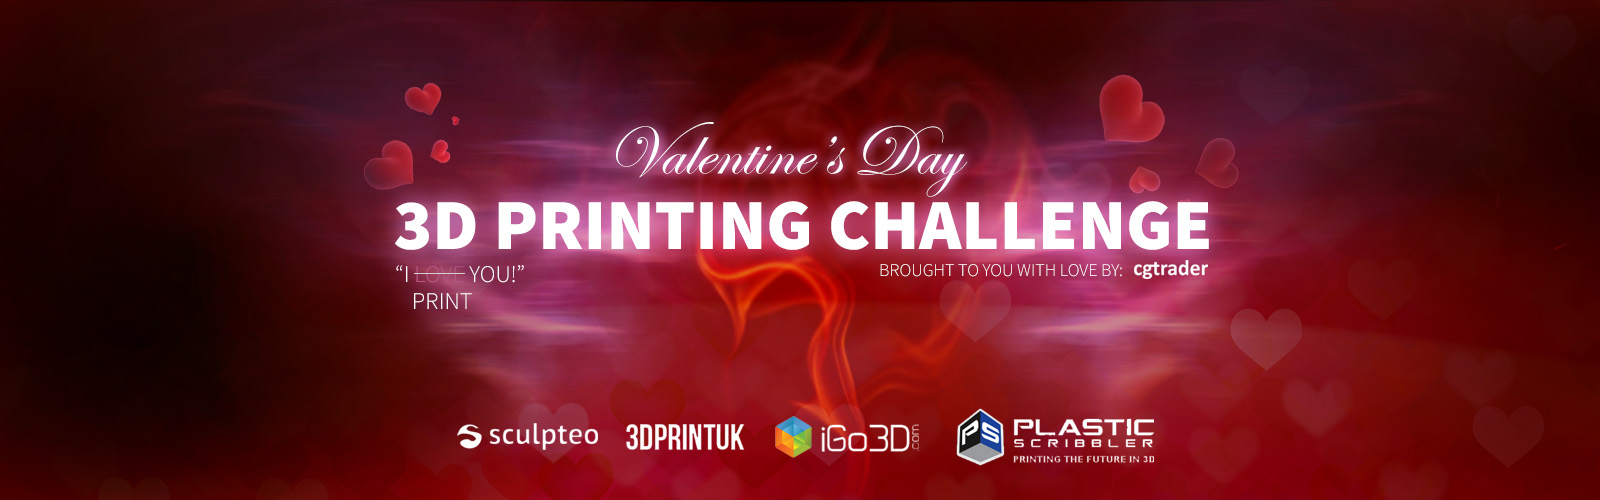 Valentine's 3D Printing Challenge